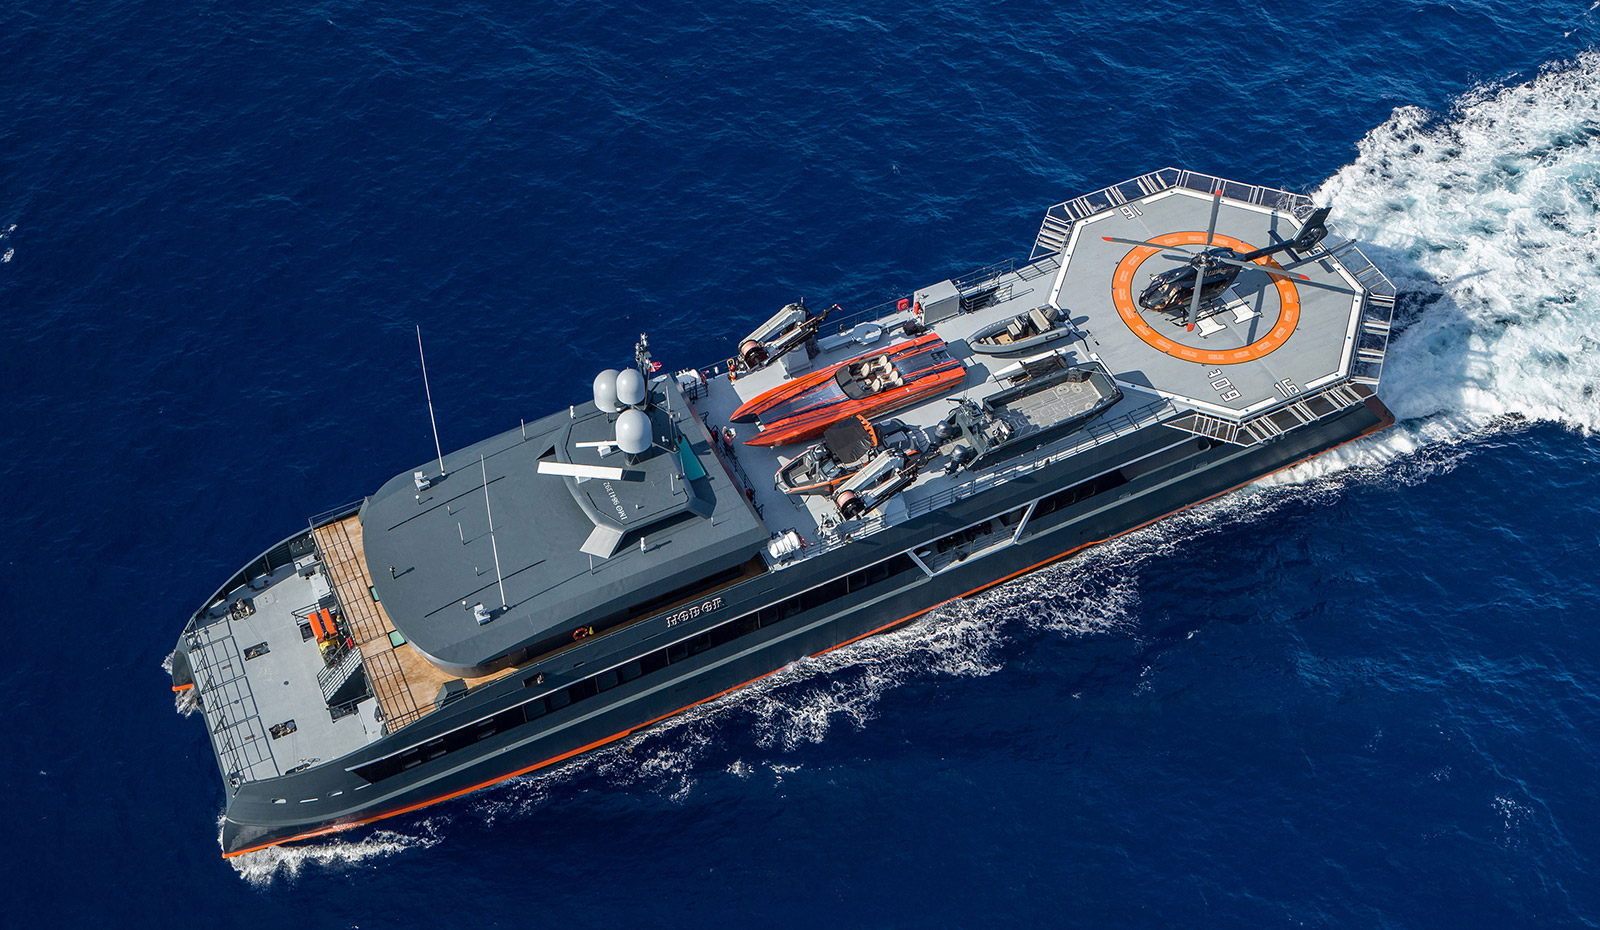 the-damen-superyacht-support-vessel-new-frontiers-is-one-of-the-best-superyacht-support-vessels